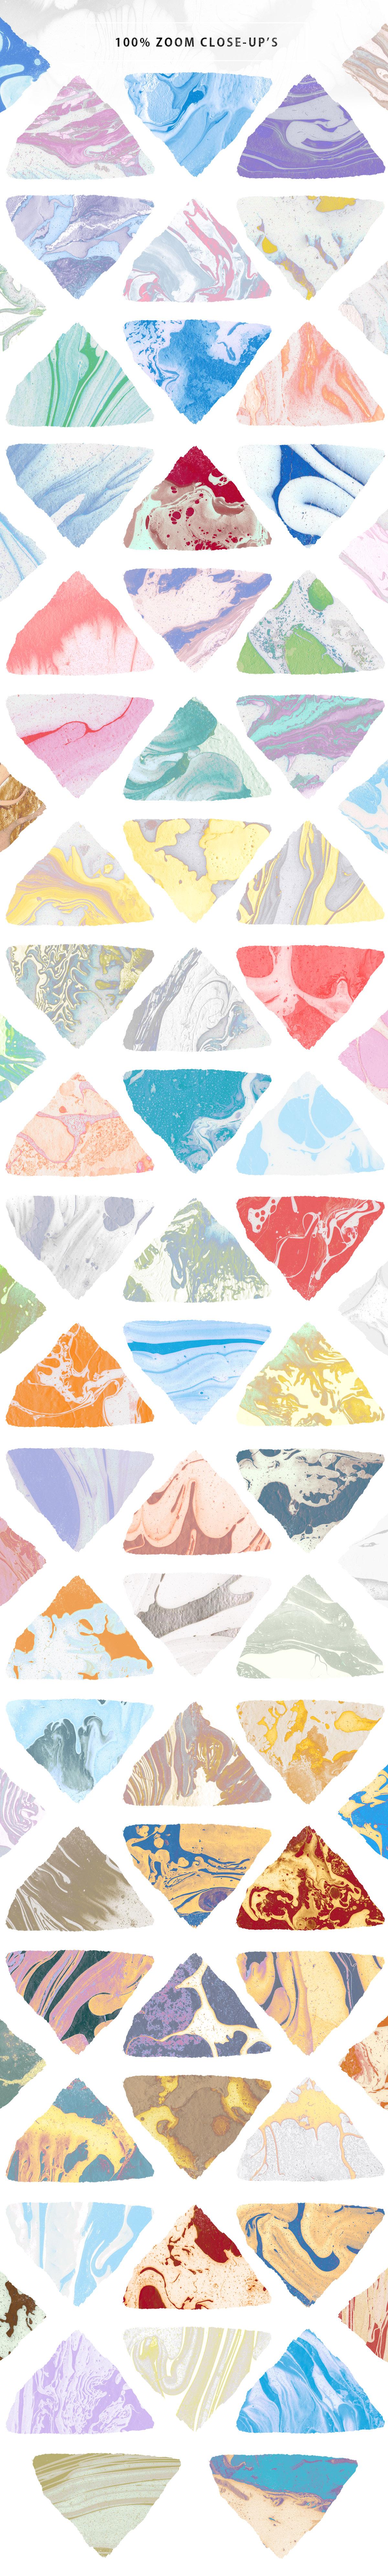 Wet Paint Textures Vol. 1 example image 11